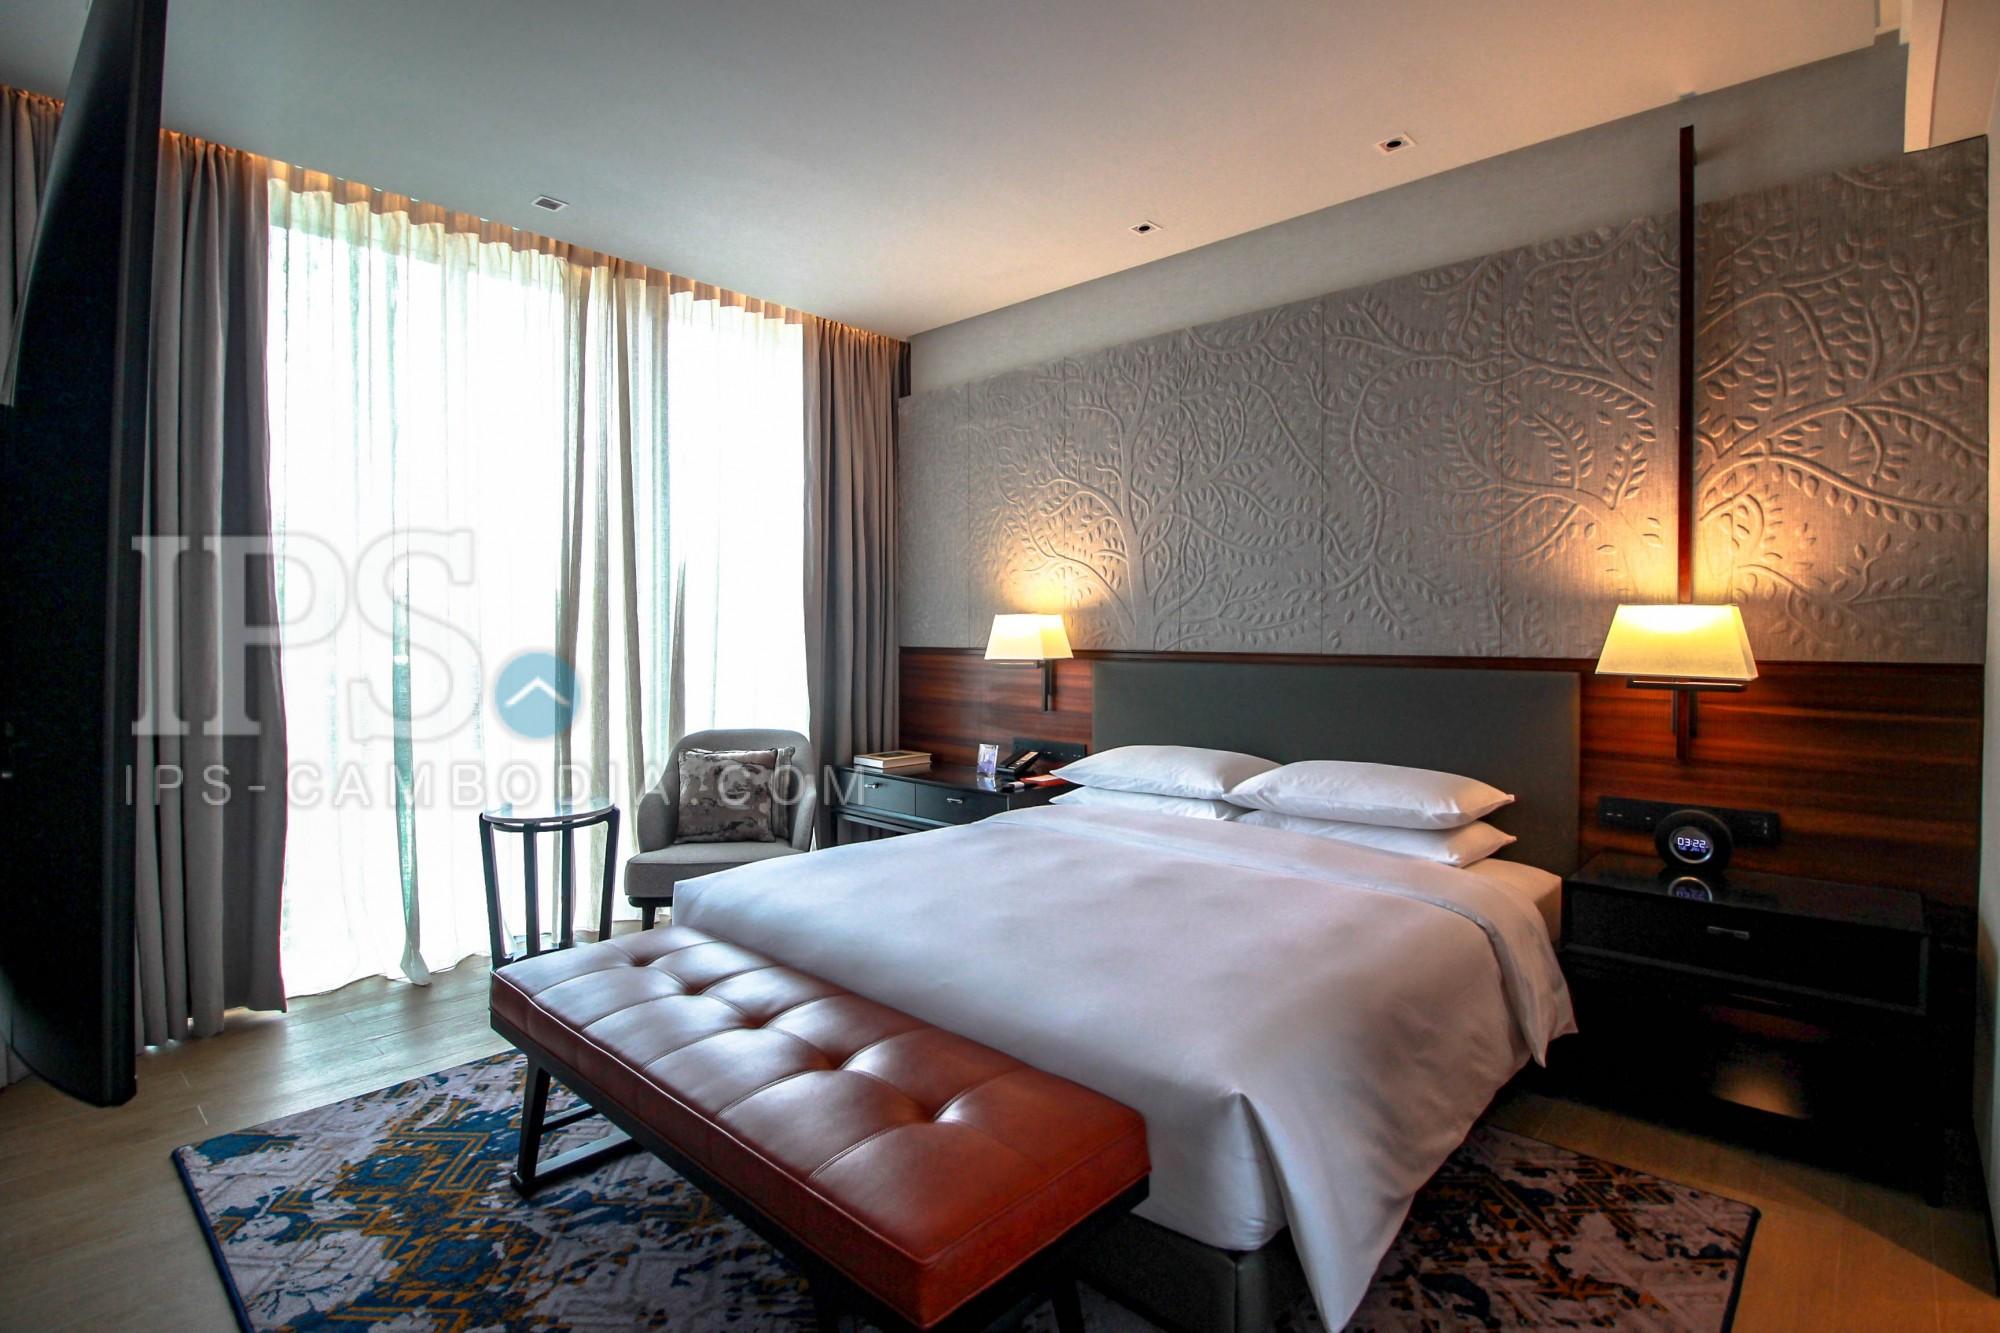 2 Bedroom Serviced Apartment For Rent - Daun Penh, Phnom Penh